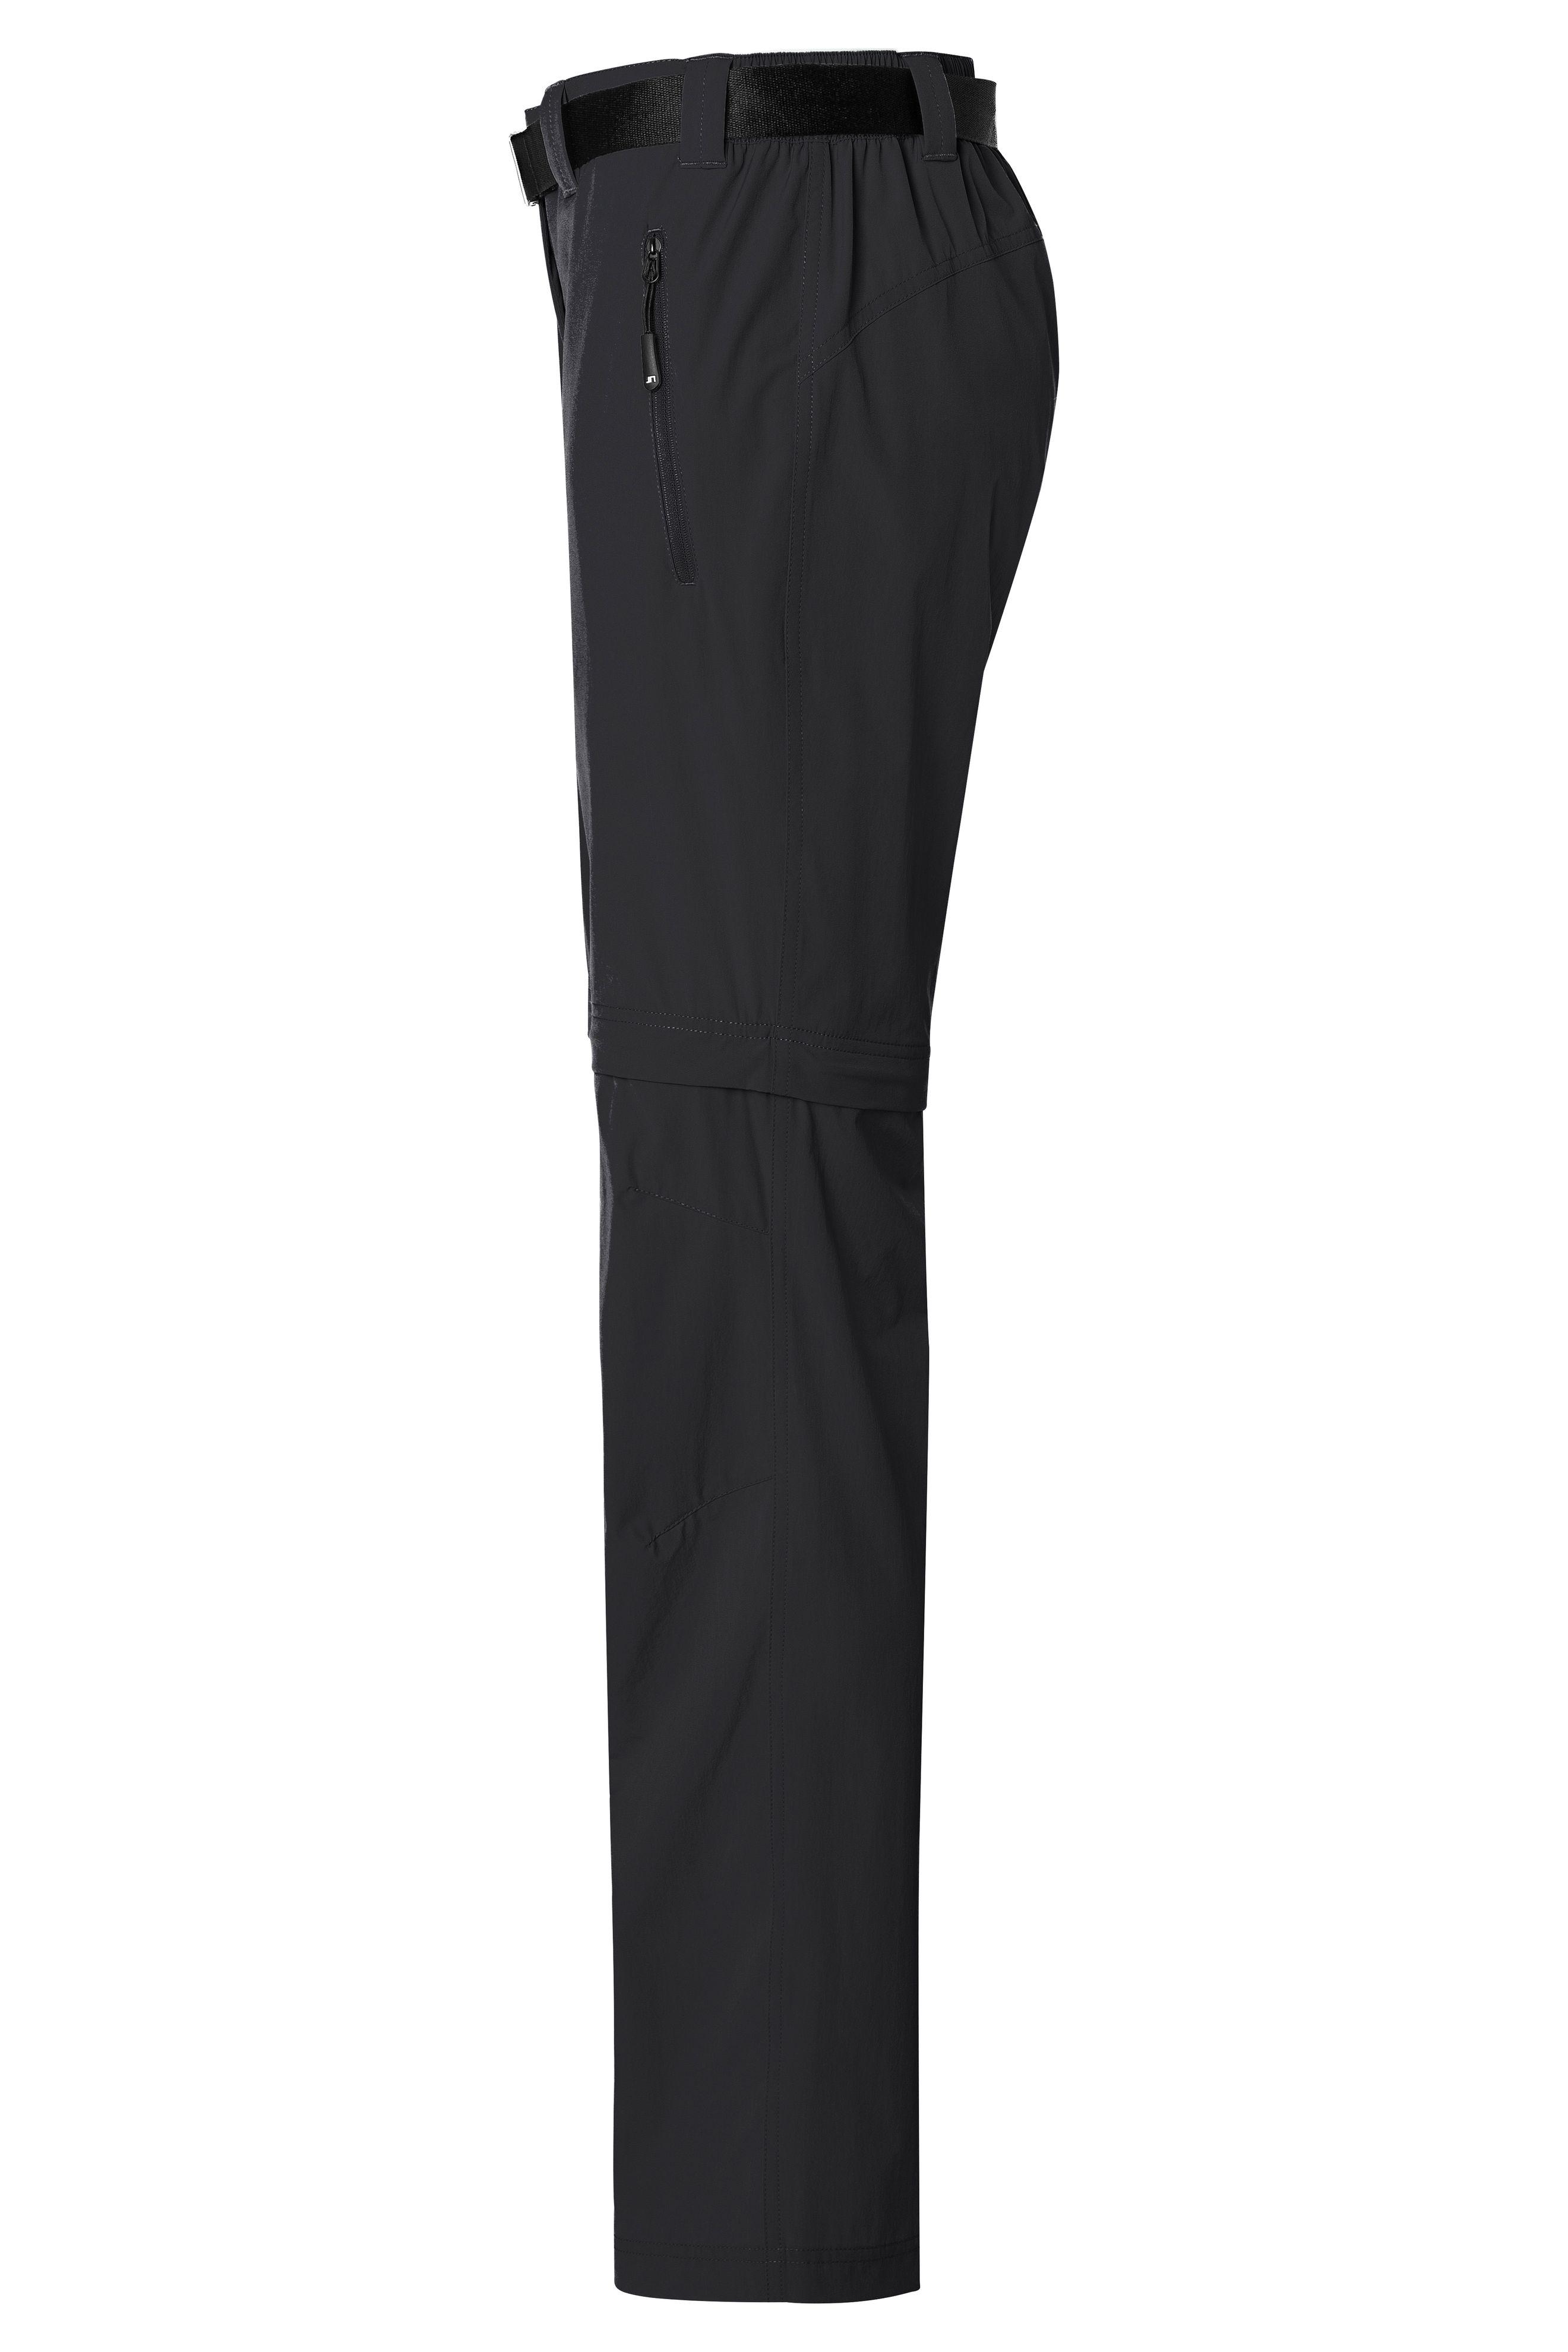 Segelfliegerhose Zip-Off mit extra langem Reißverschluss